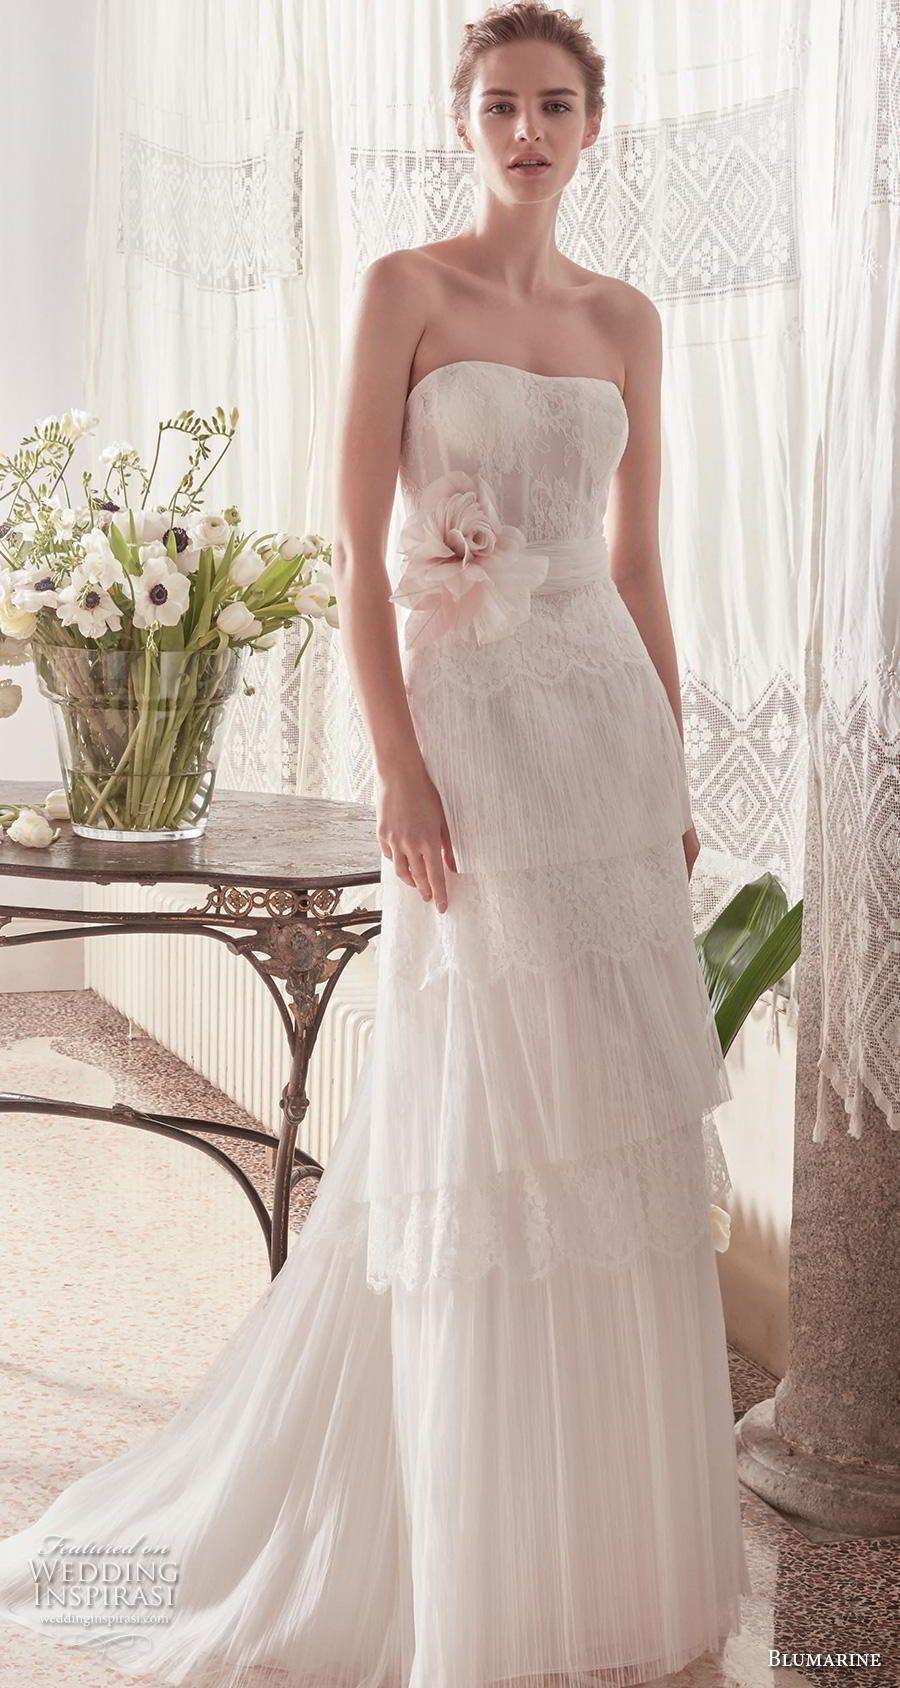 Weddinginspirasi.com featuring - blumarine sposa 2019 bridal strapless semi  sweetheart neckline light embellishment tiered 9f1a0857e75